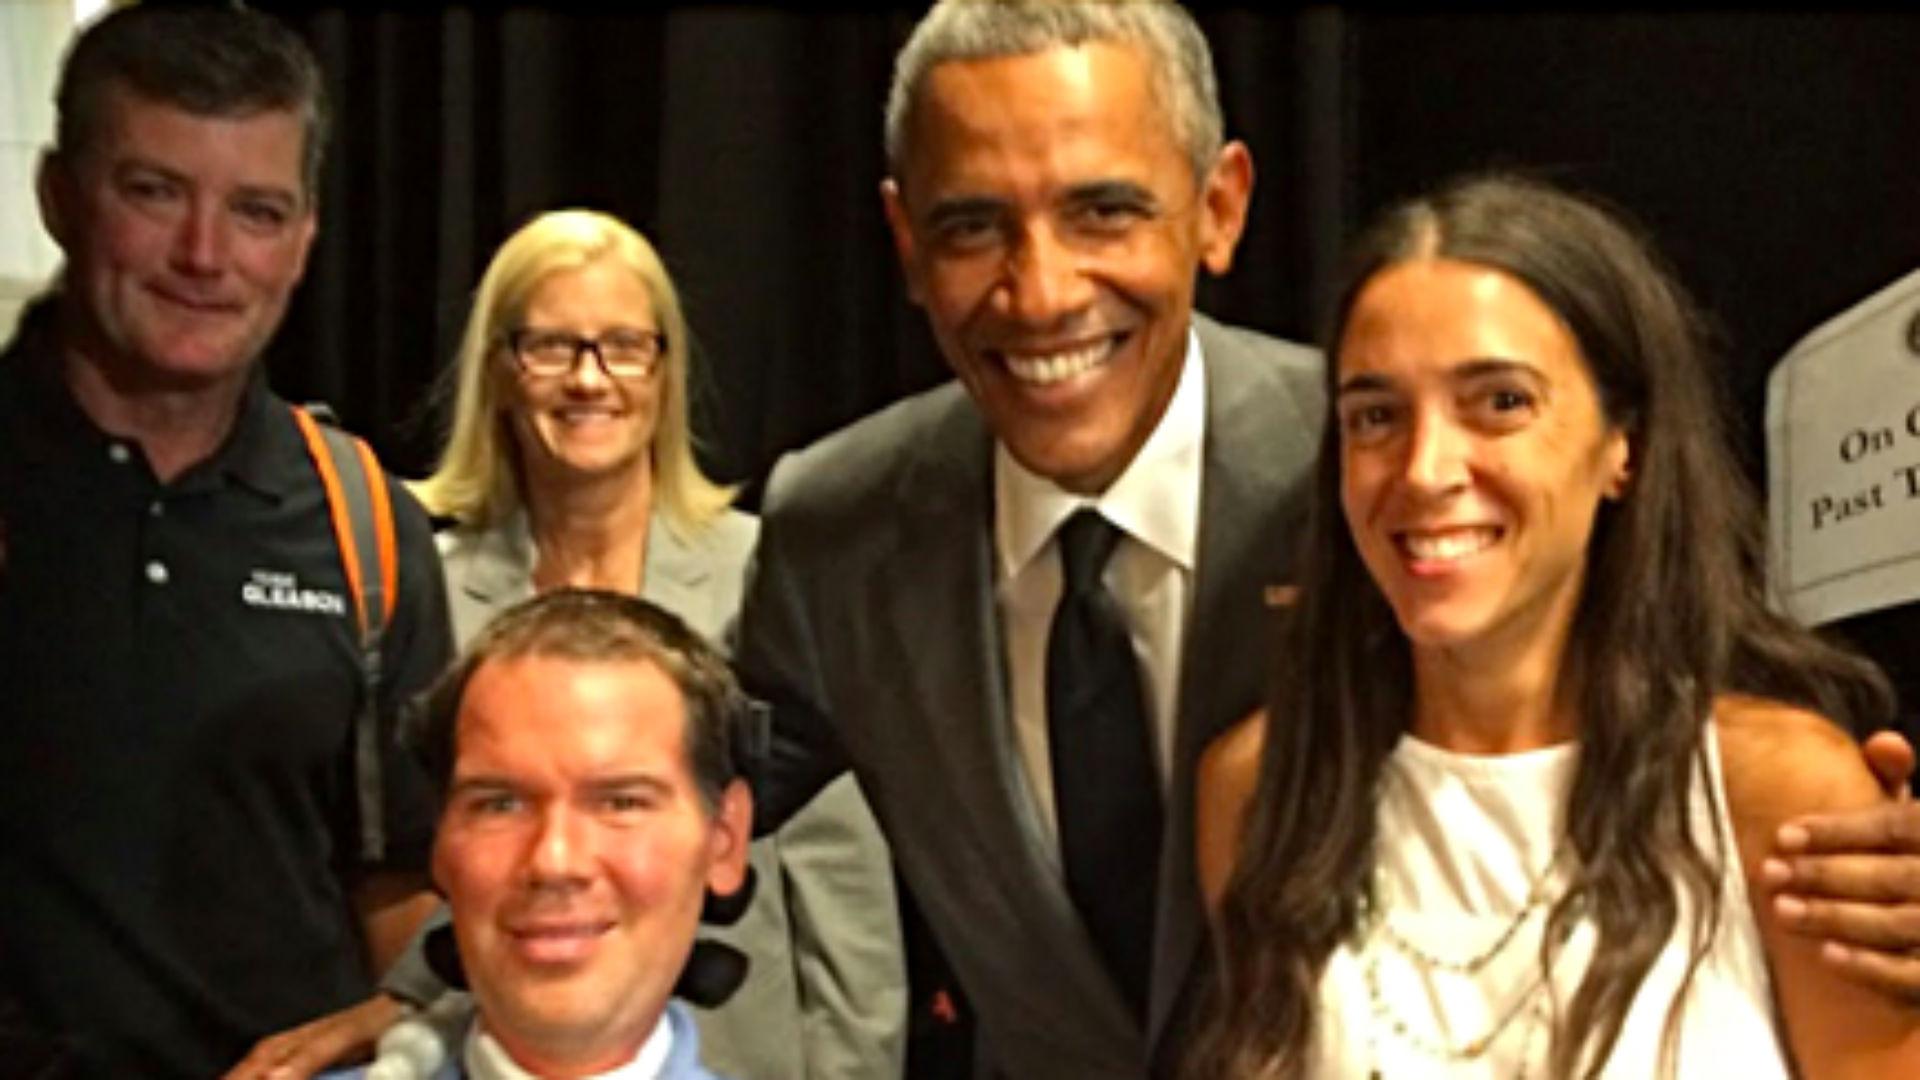 Steve Gleason and President Barack Obama